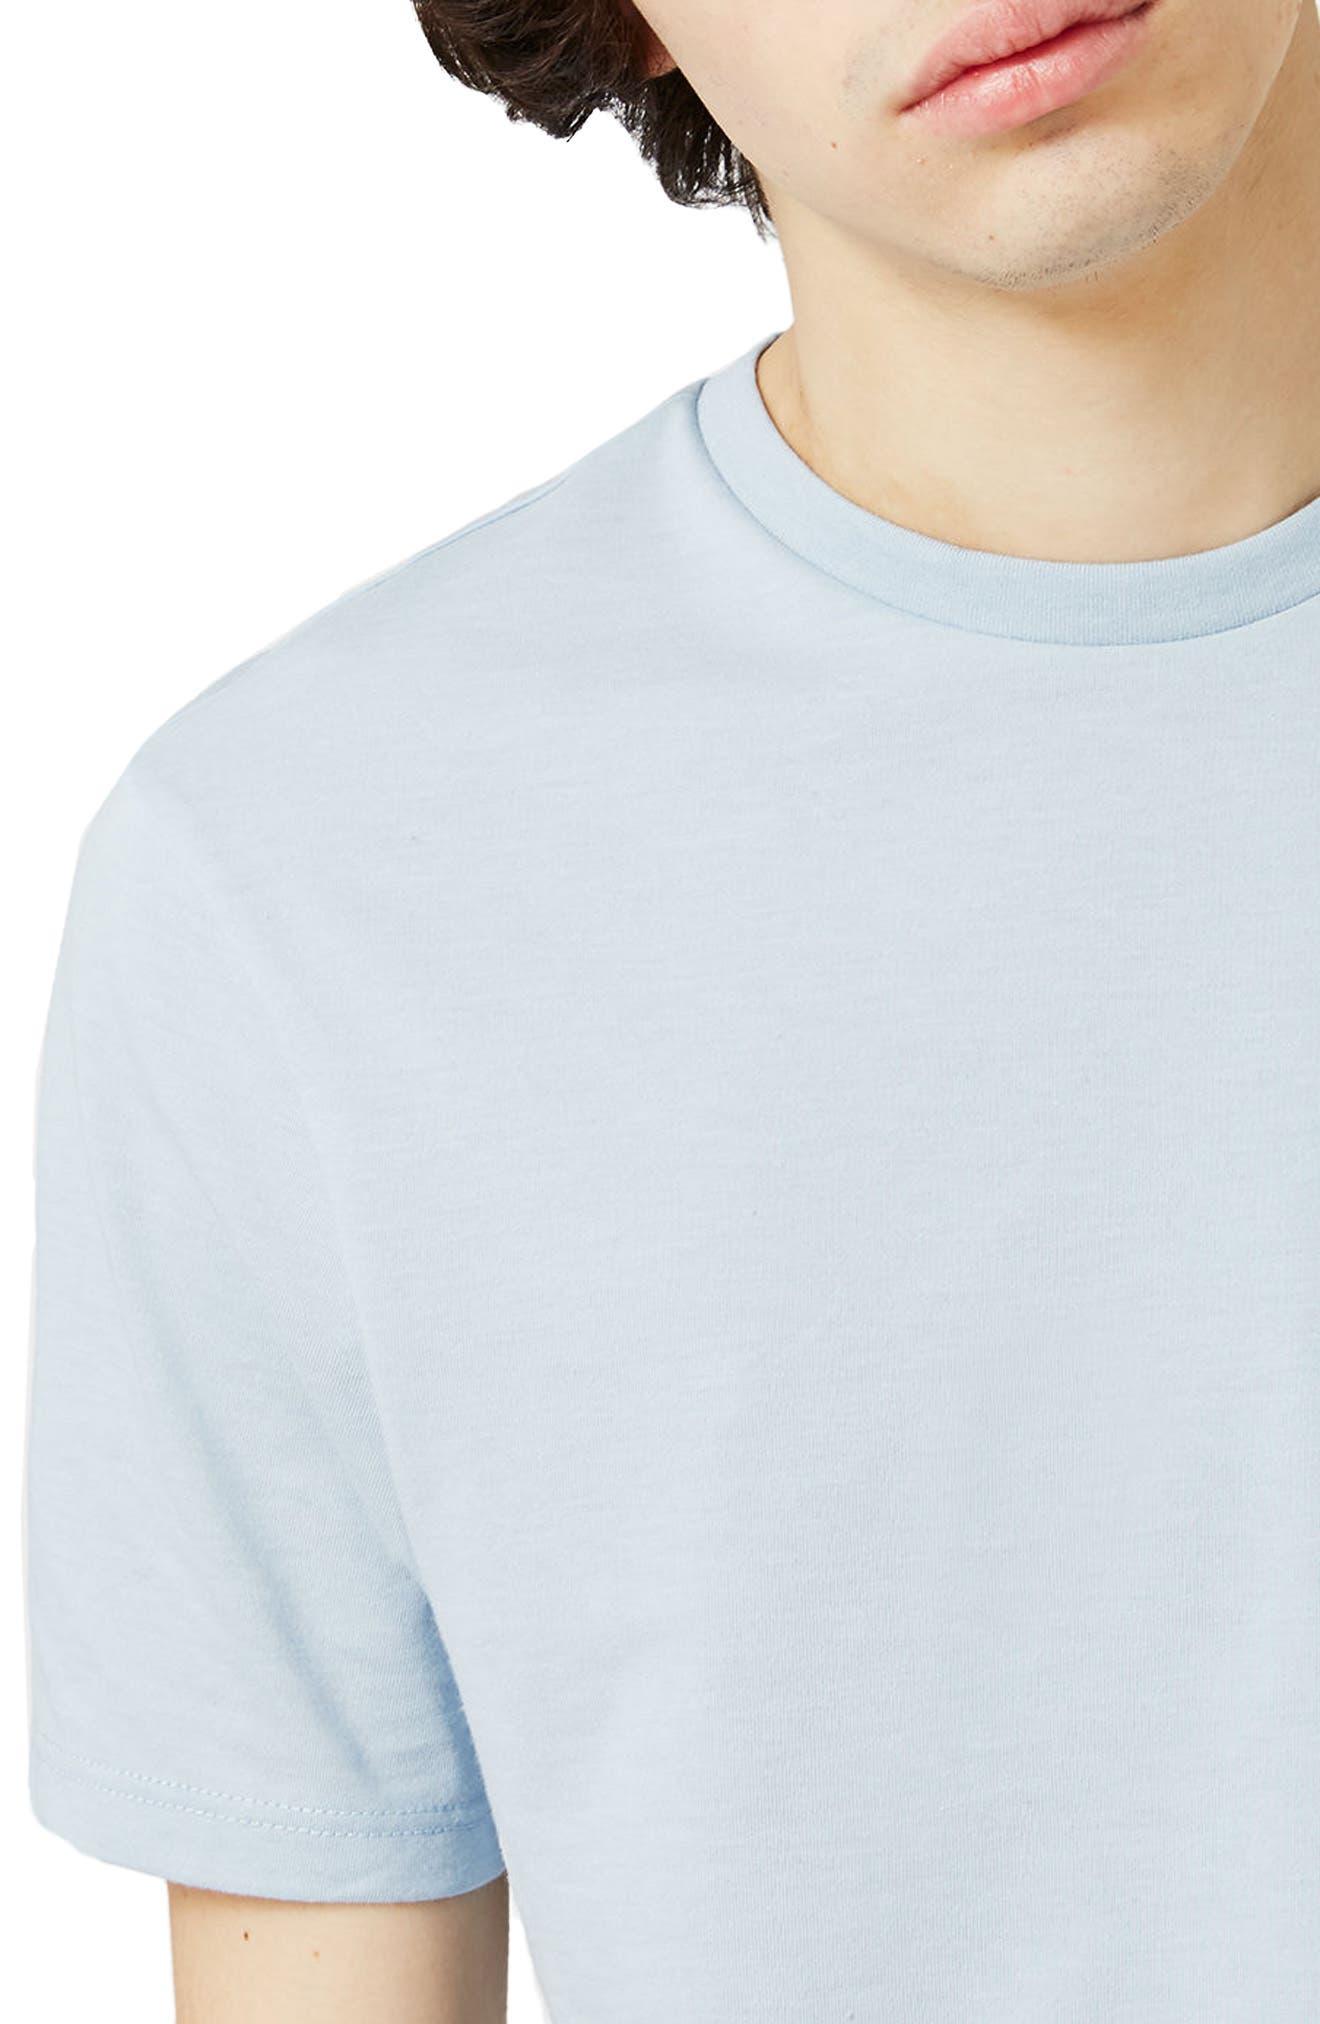 Slim Fit Crewneck T-Shirt,                             Alternate thumbnail 263, color,